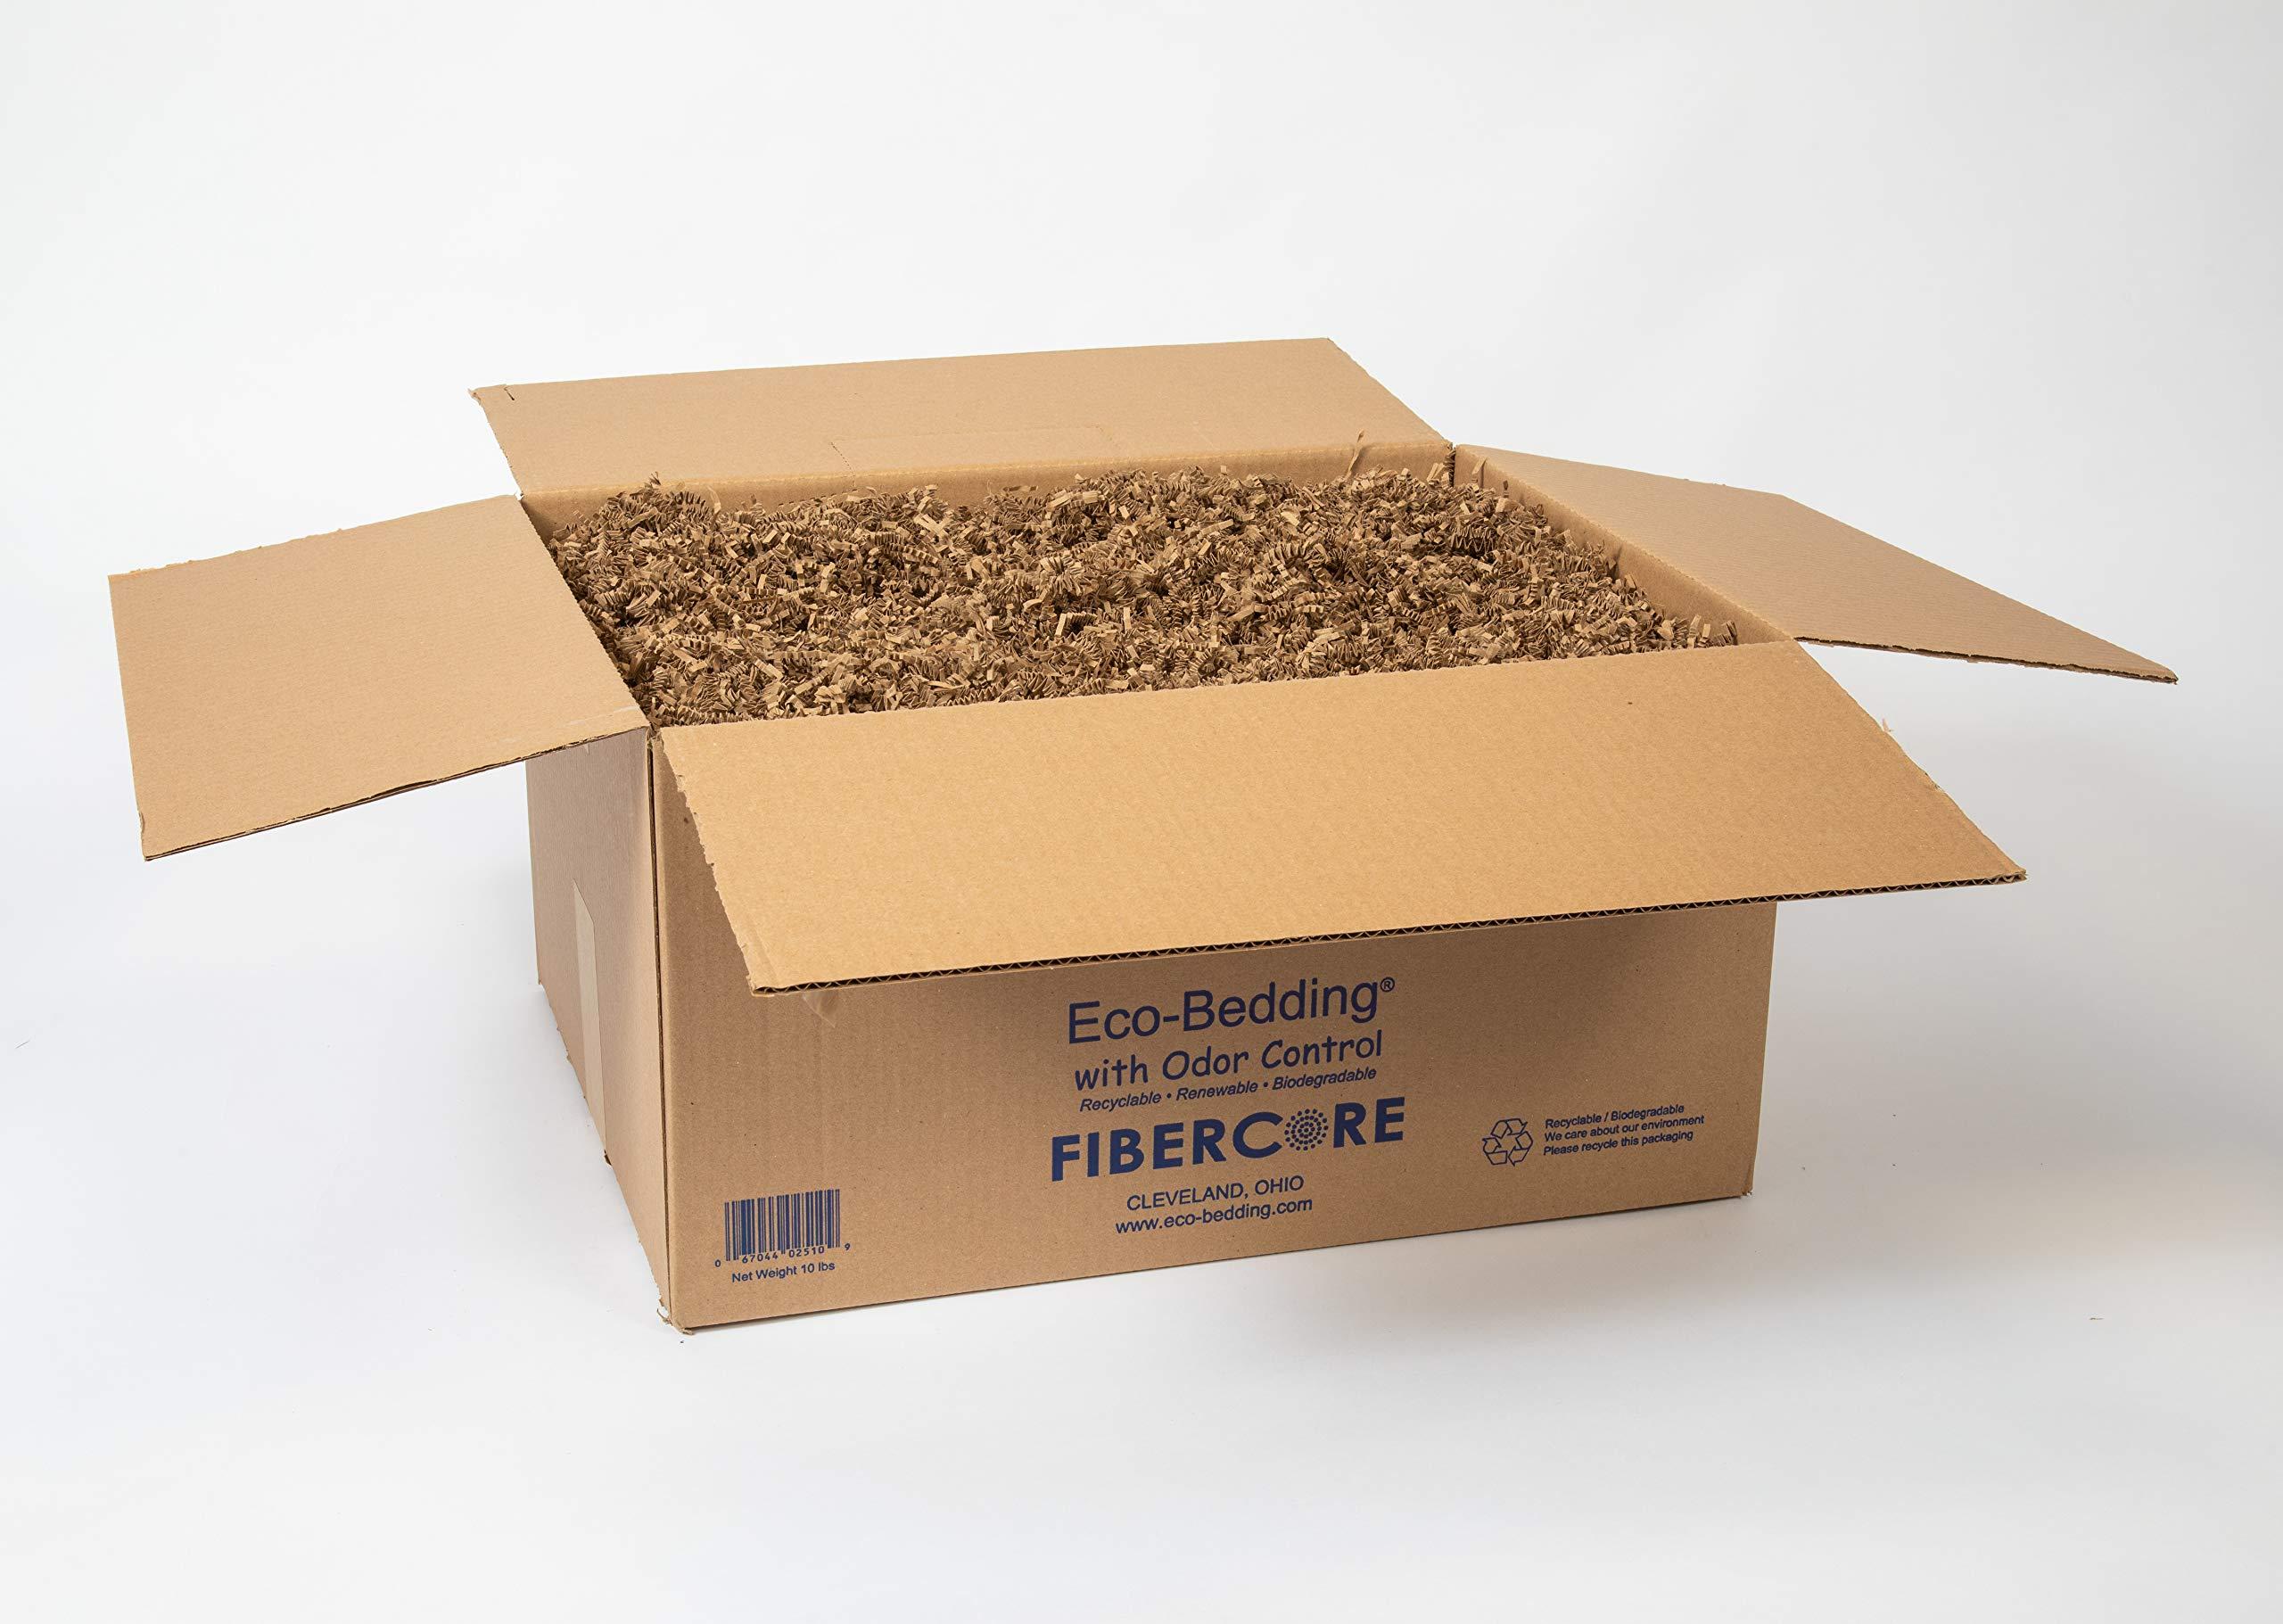 FiberCore Eco-Bedding Odor Control, 10 lb, Box Brown by FiberCore Eco-Bedding Odor Control